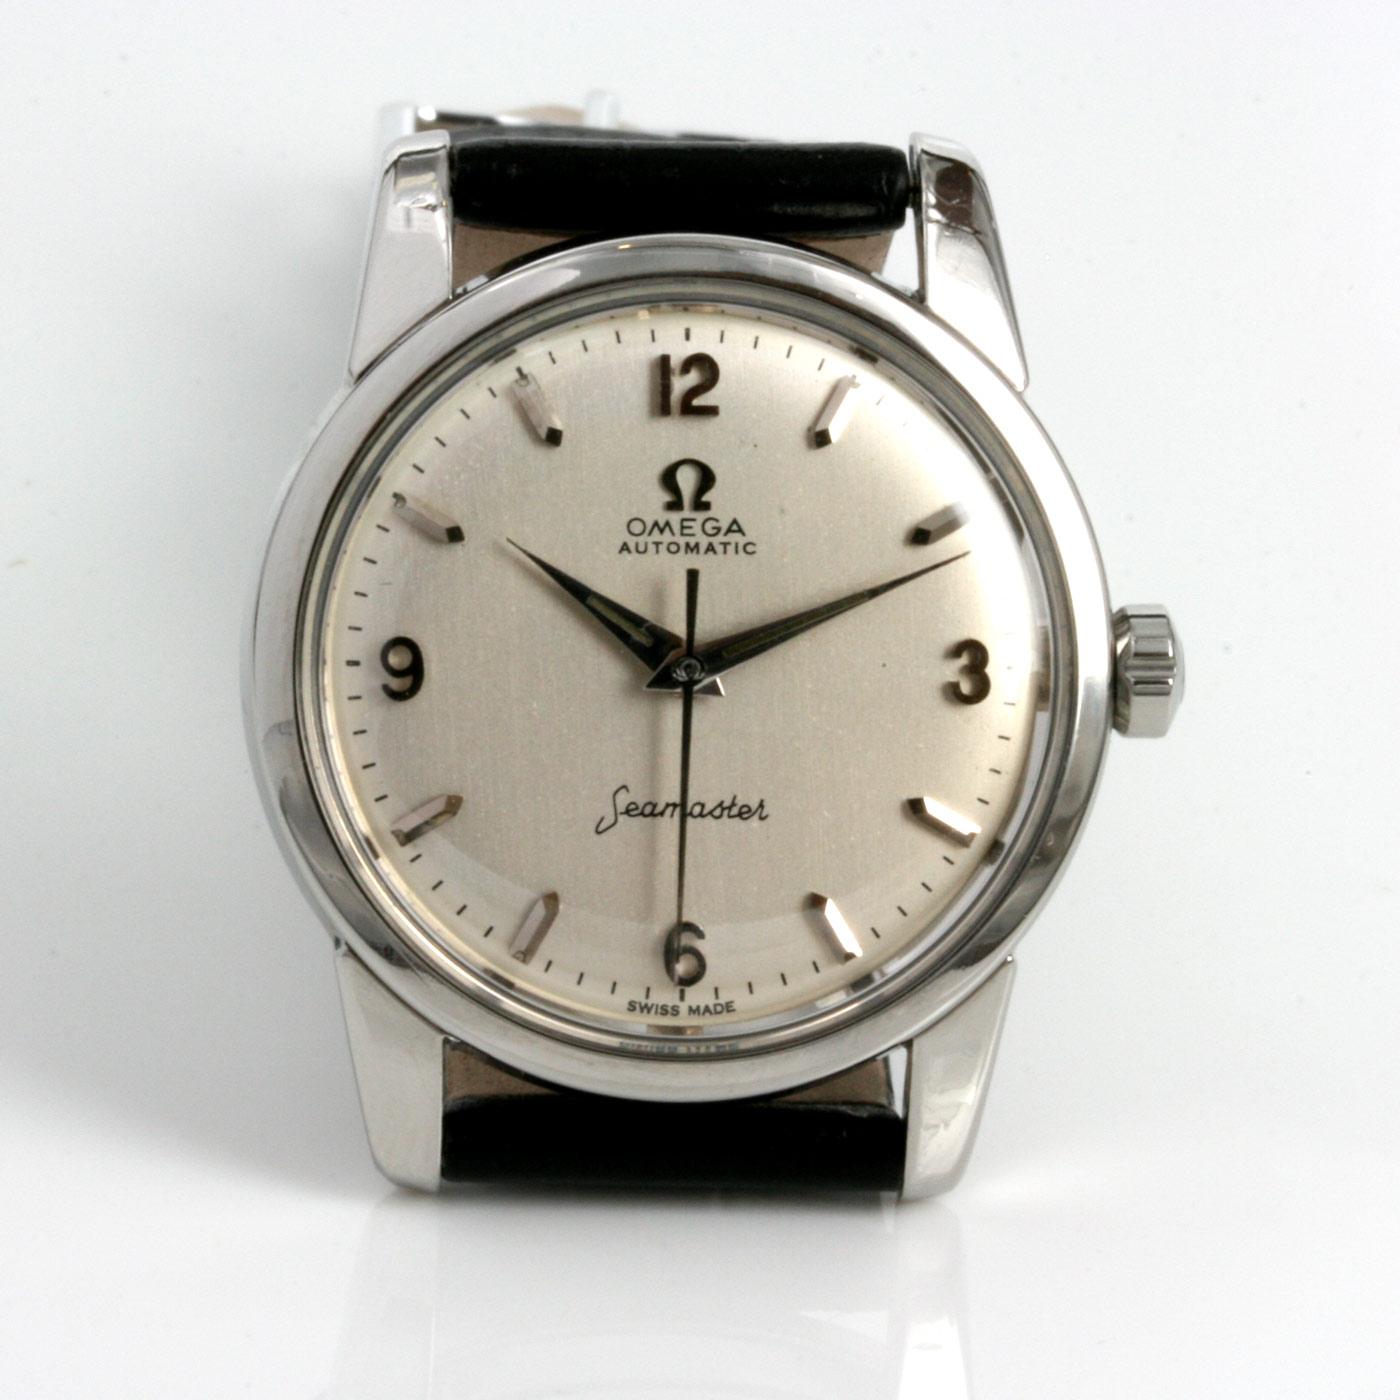 Buy 1959 vintage omega seamaster sold items sold omega watches sydney kalmarantiques for Omega watch seamaster